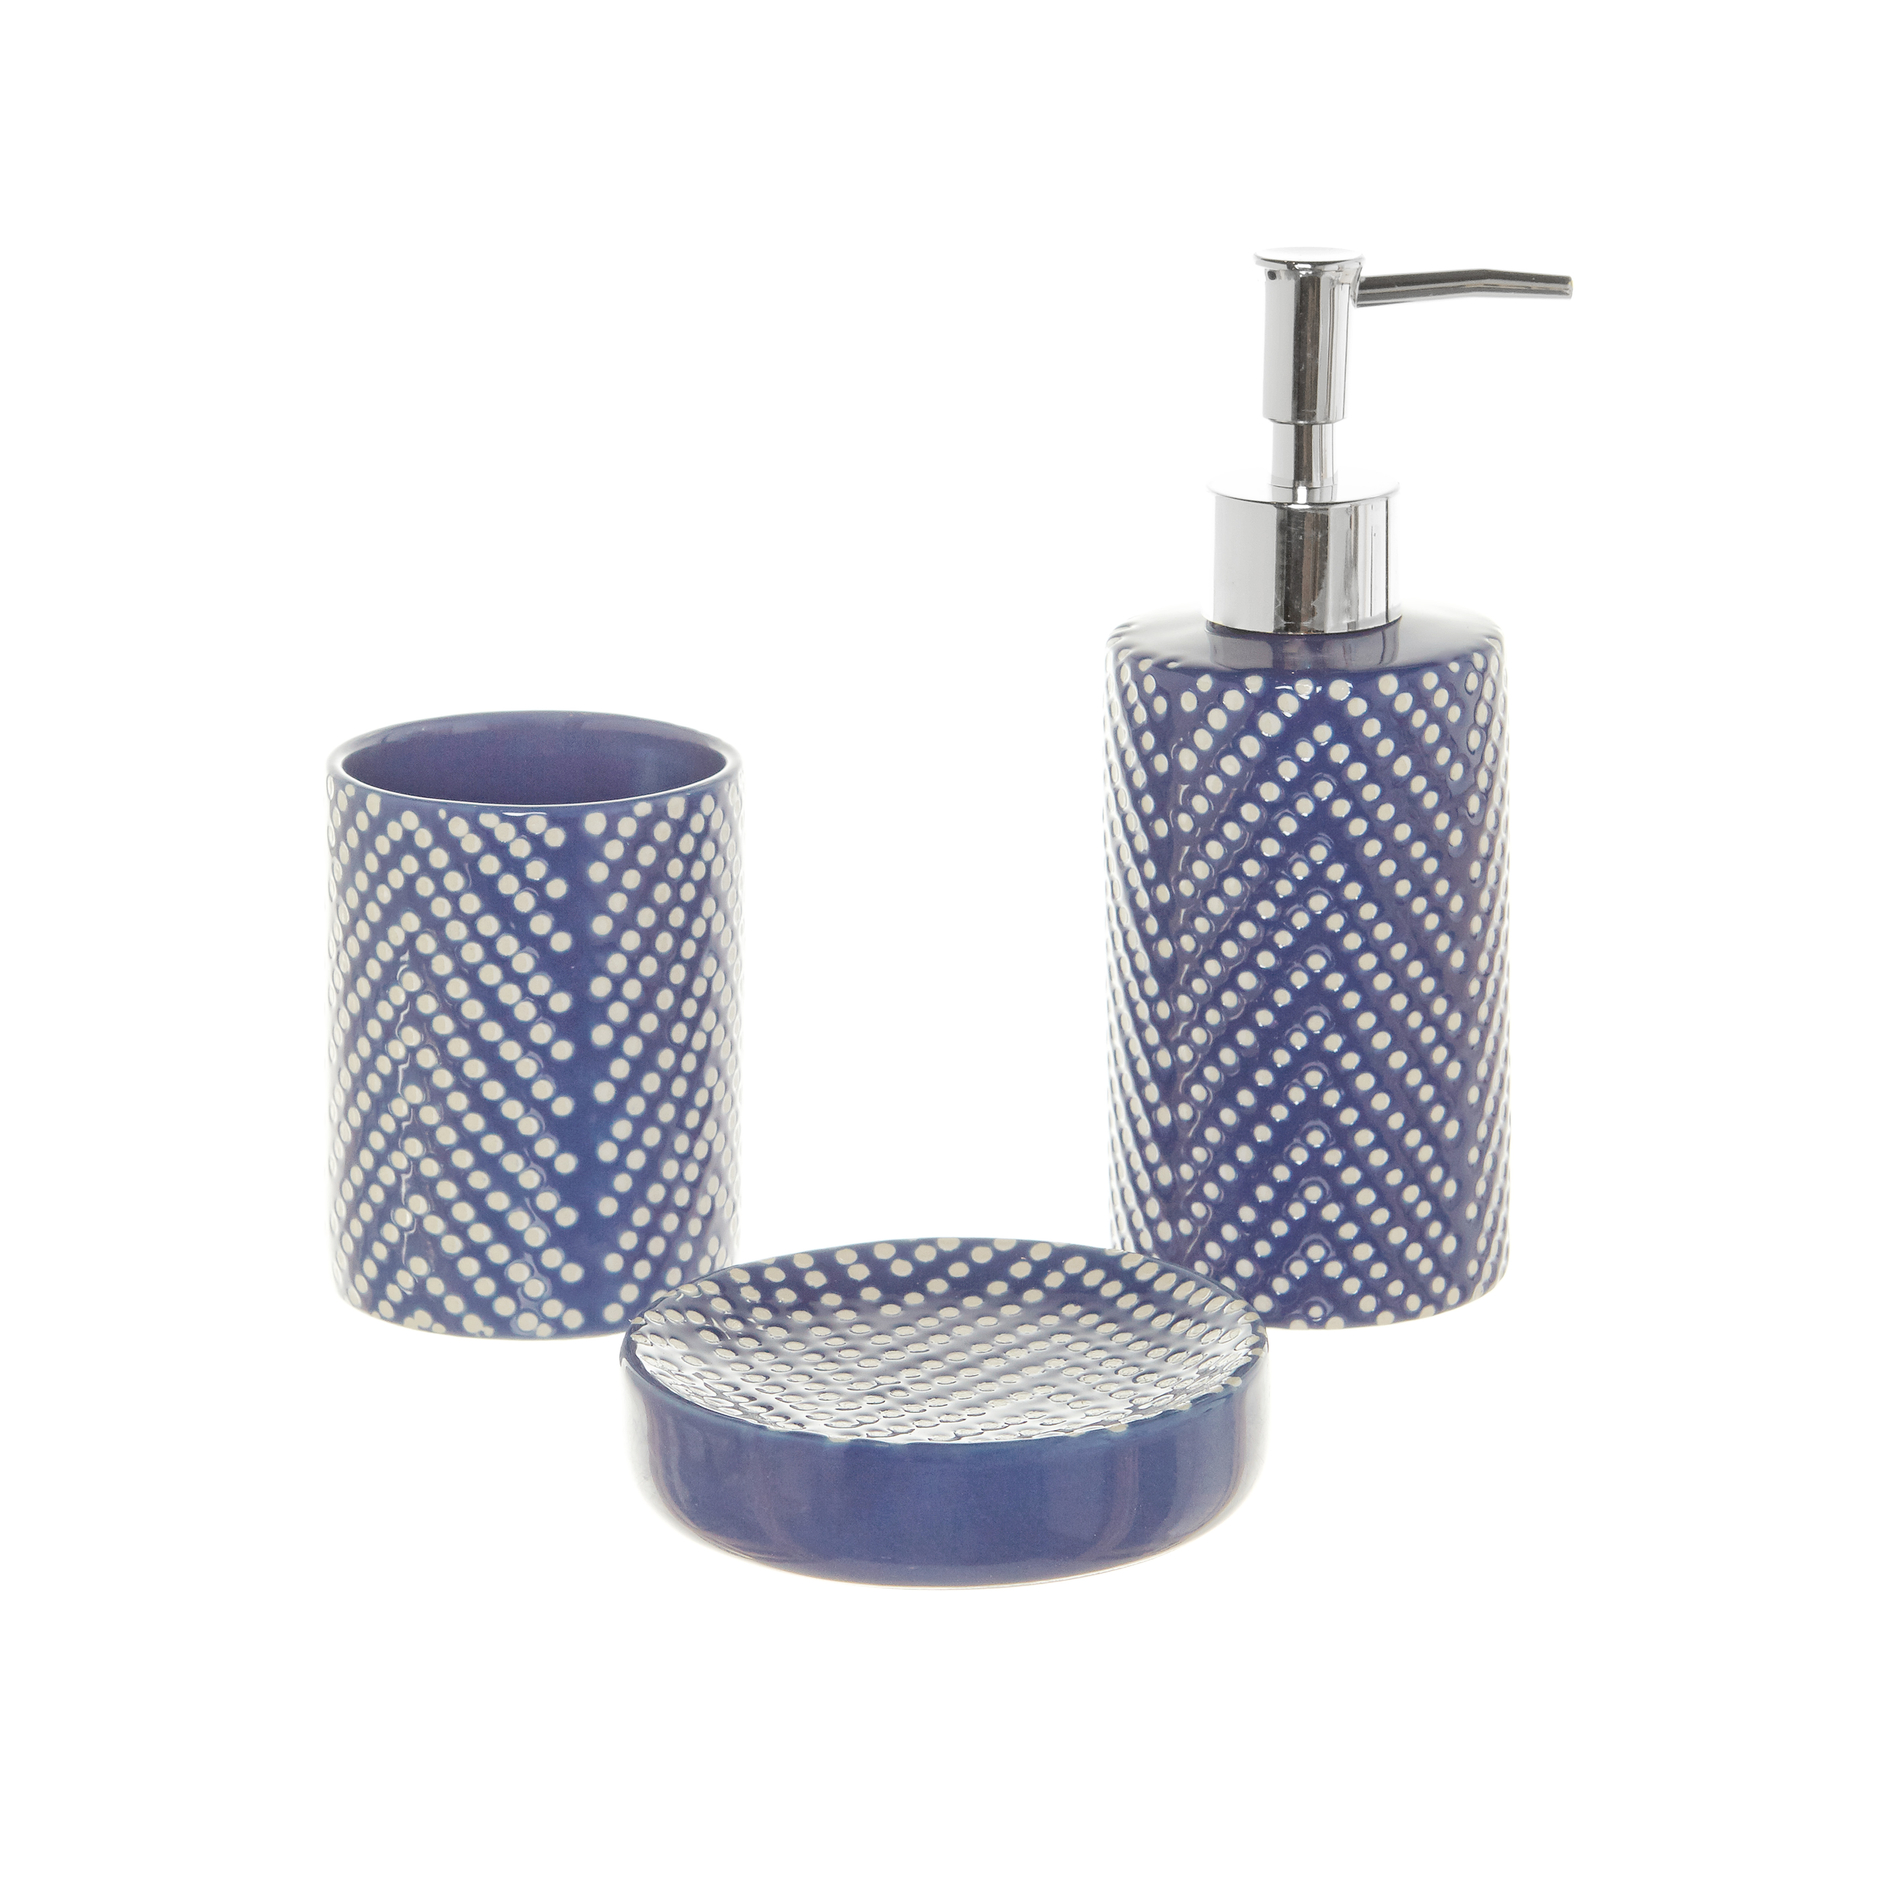 Set accessori bagno in ceramica a pois coincasa - Accessori bagno in ceramica ...